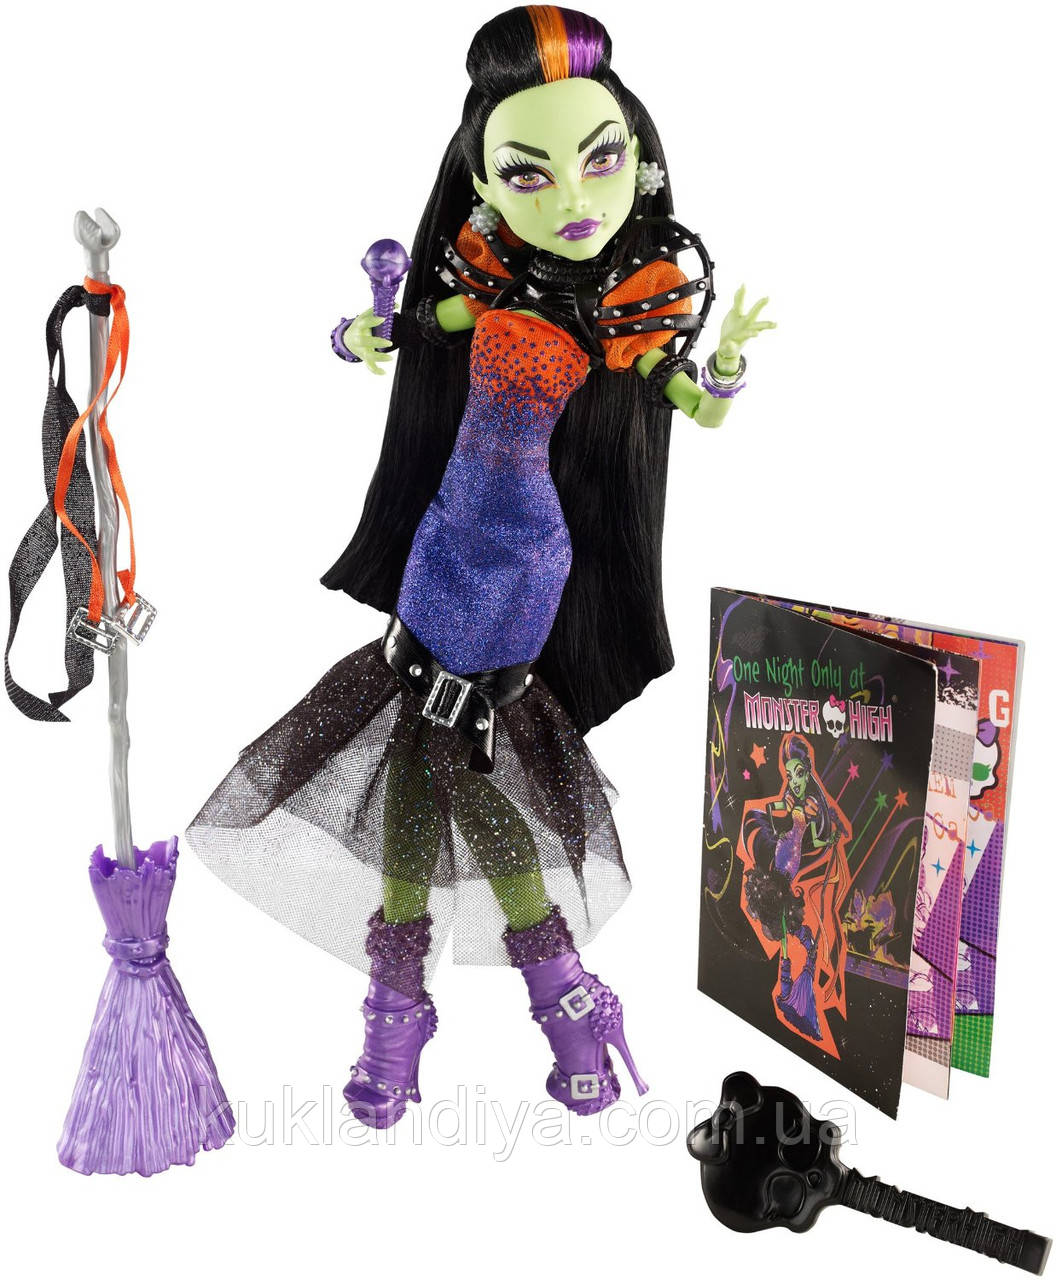 Кукла Monster High Casta Fierce Каста Фирс